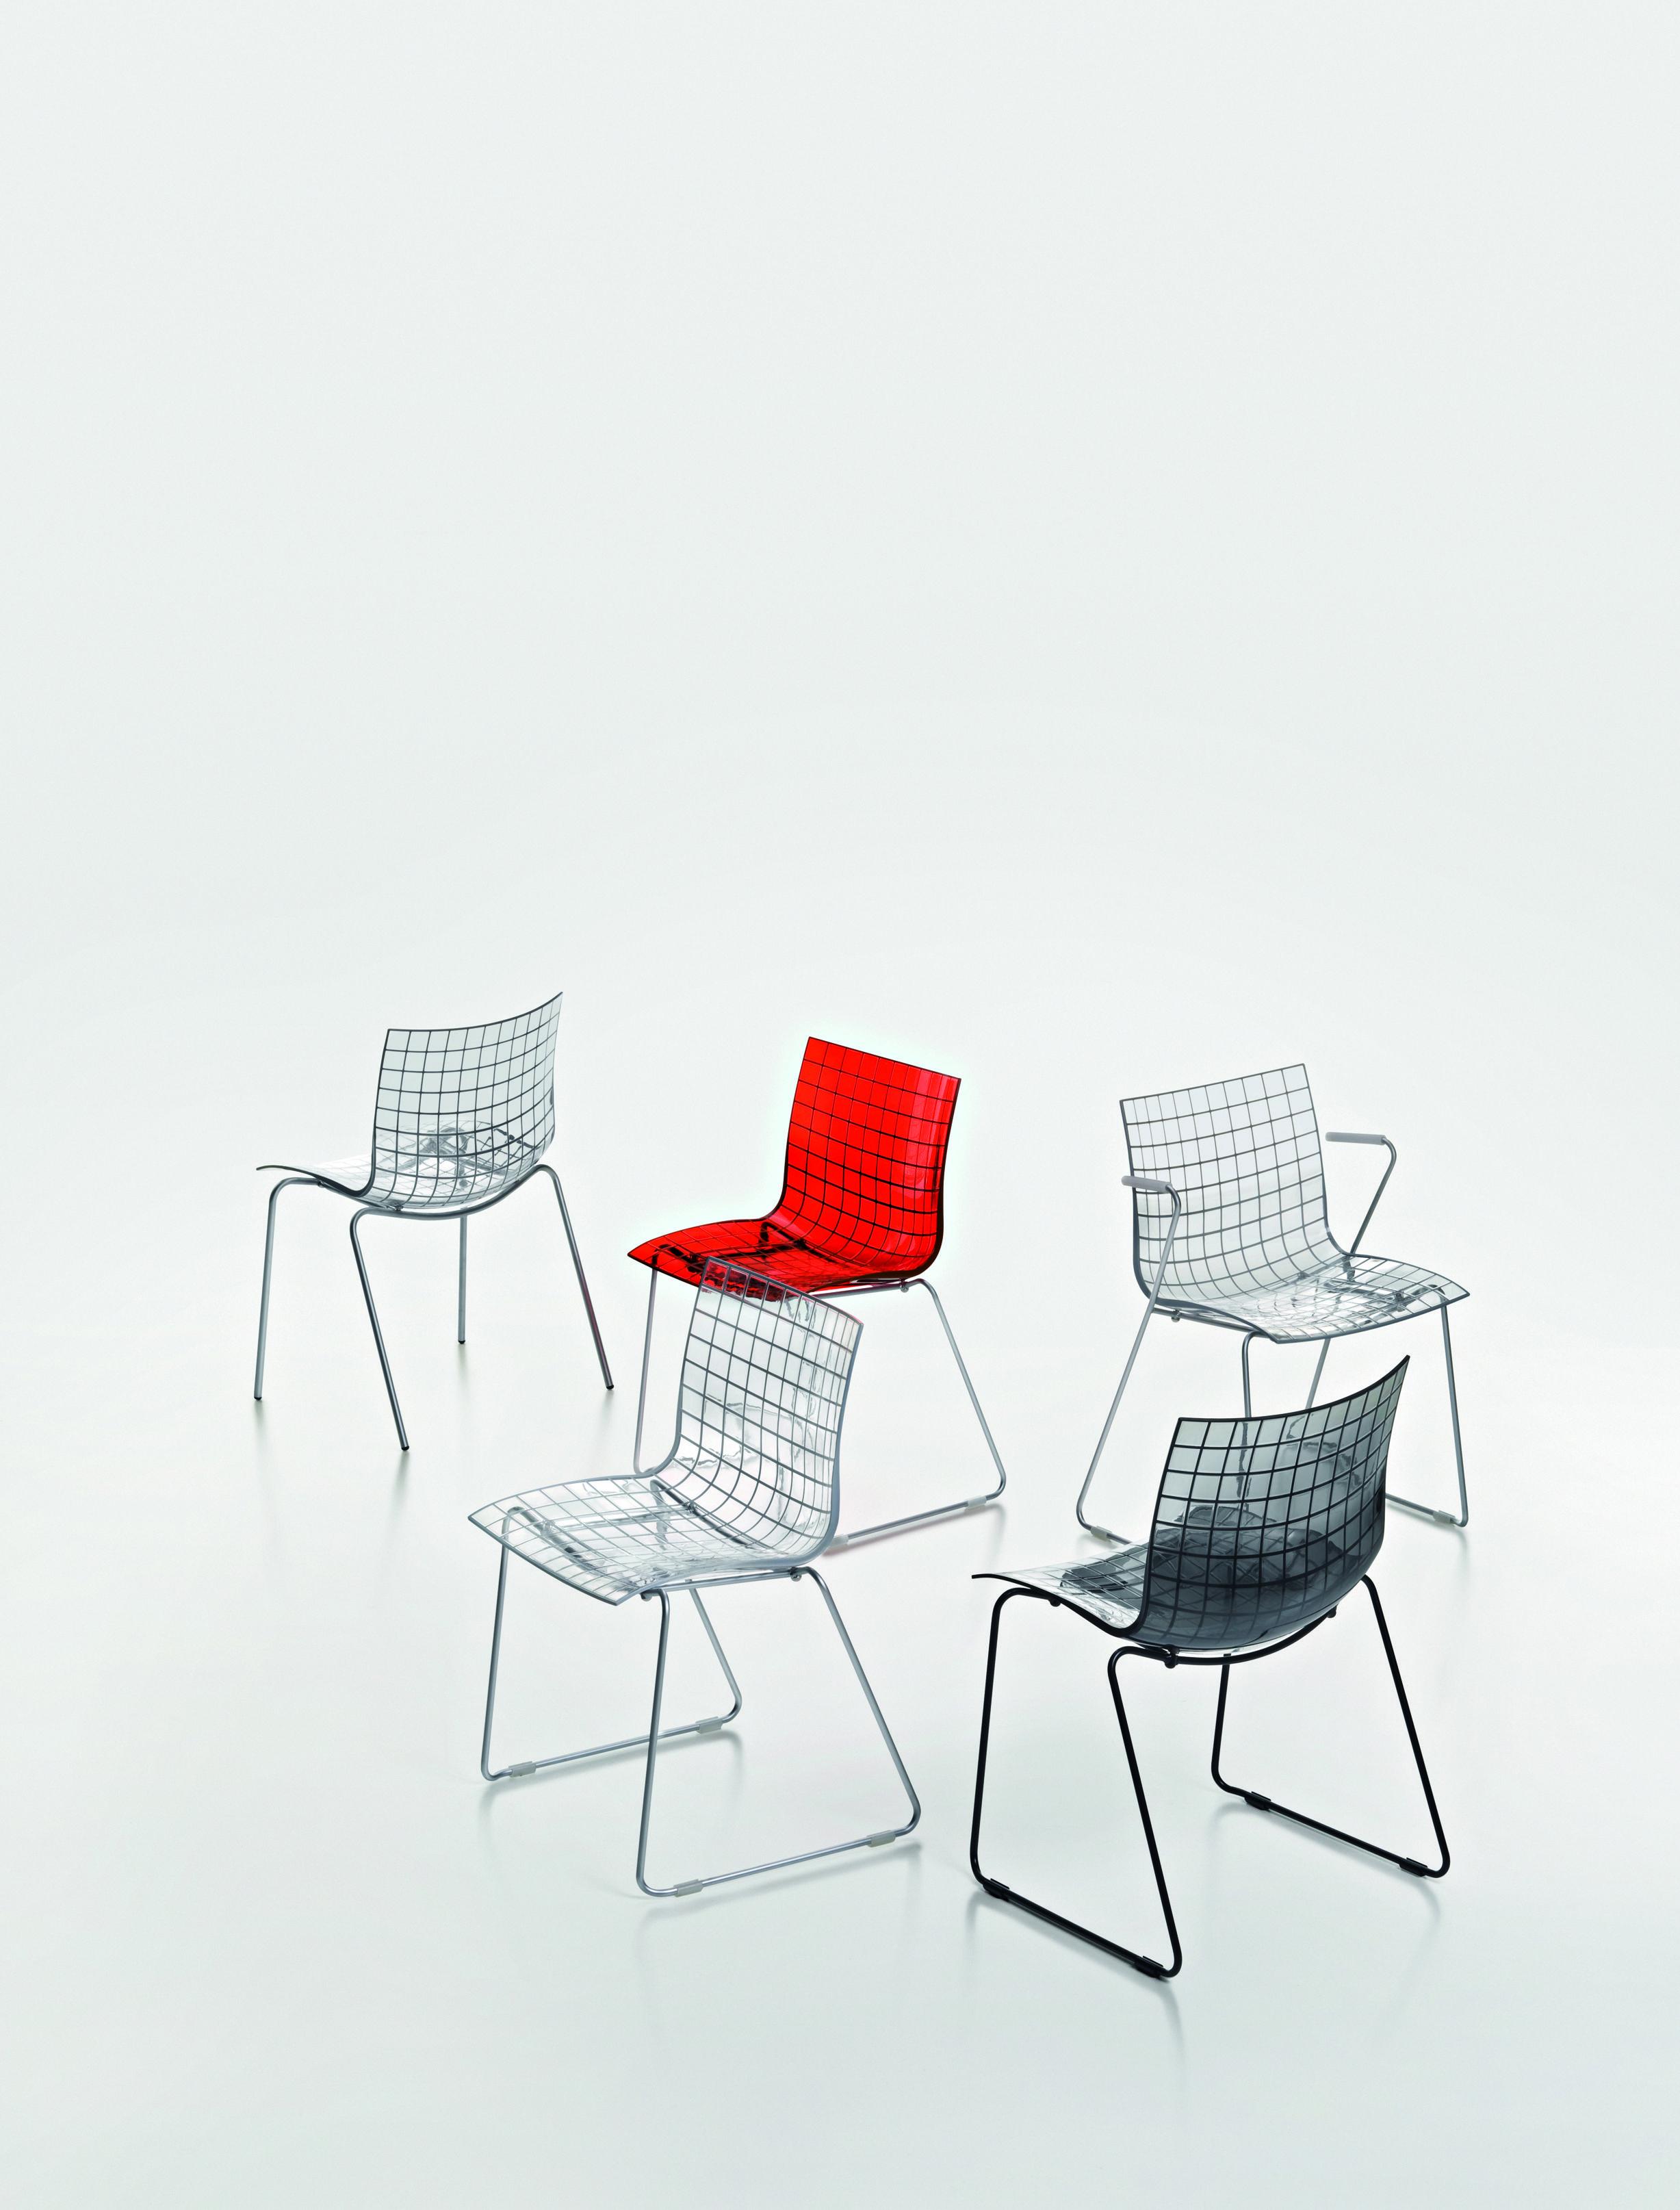 Design Chair From MaxDesign, Designer Marco Maran   Www.